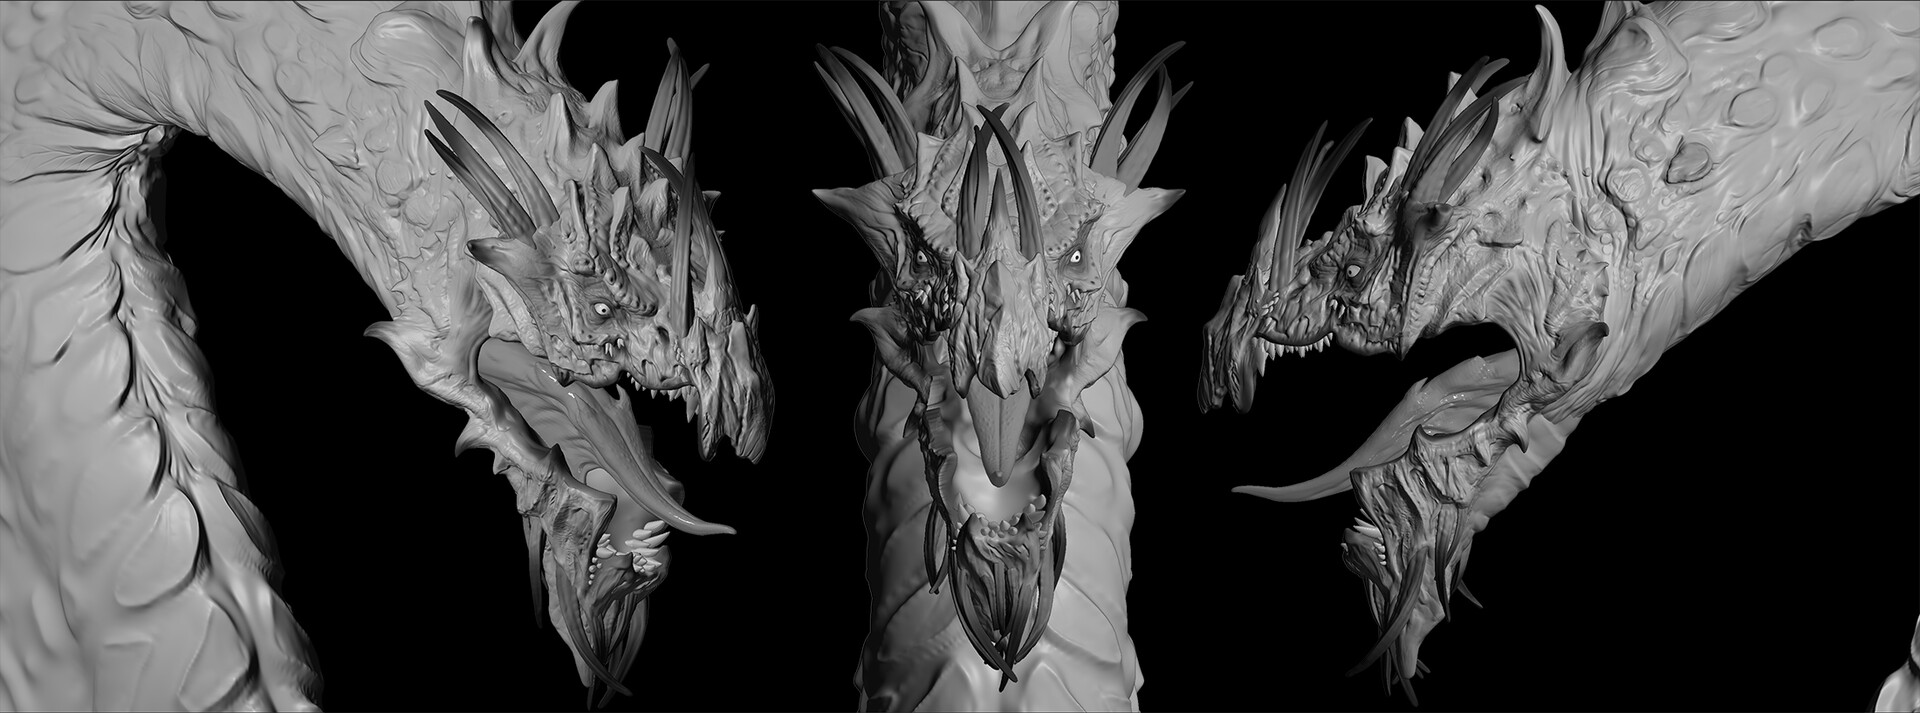 William furneaux dragonheadsculptviews